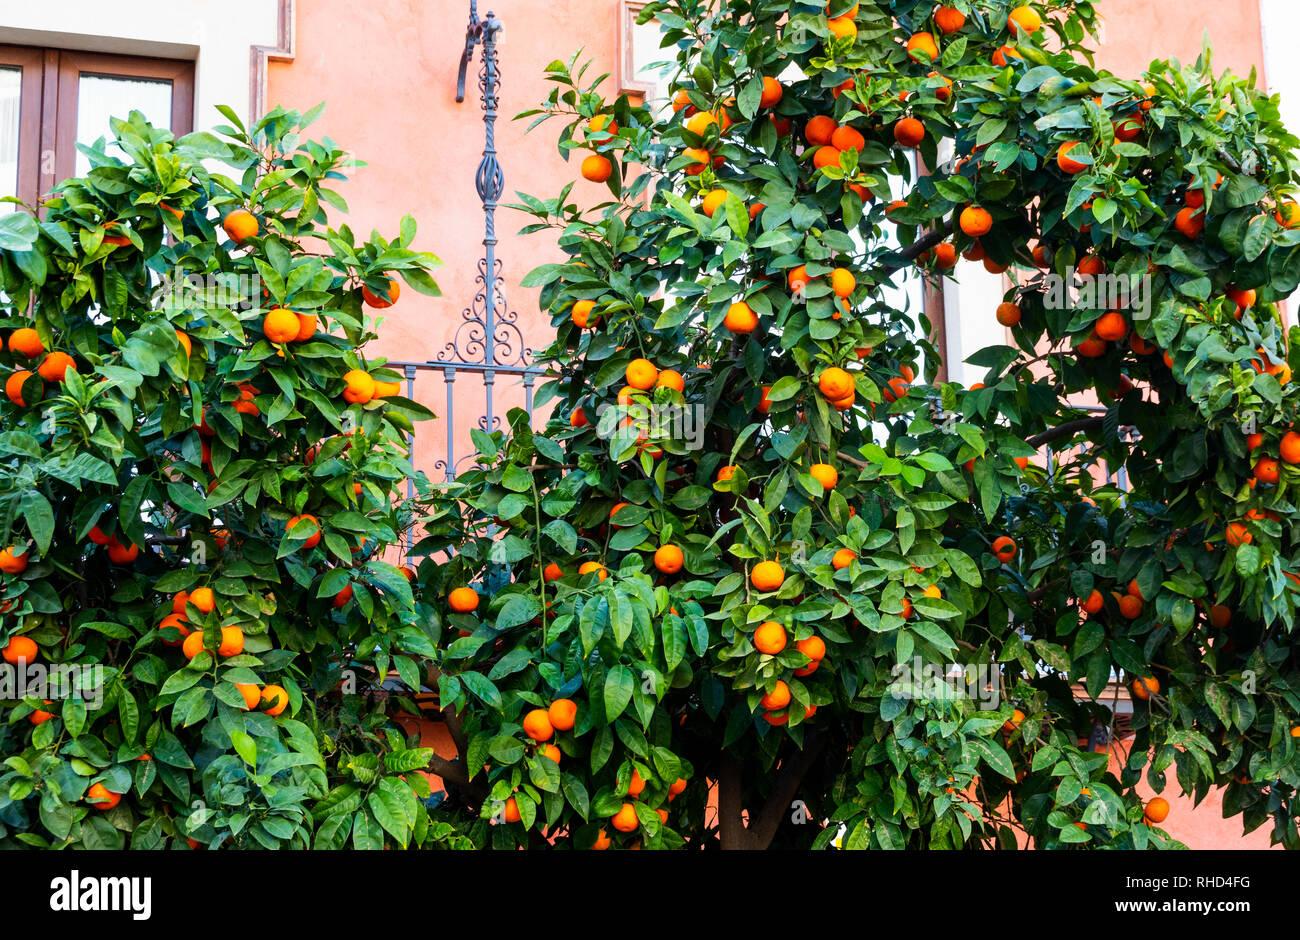 Orange trees in Seville, Spain - Stock Image